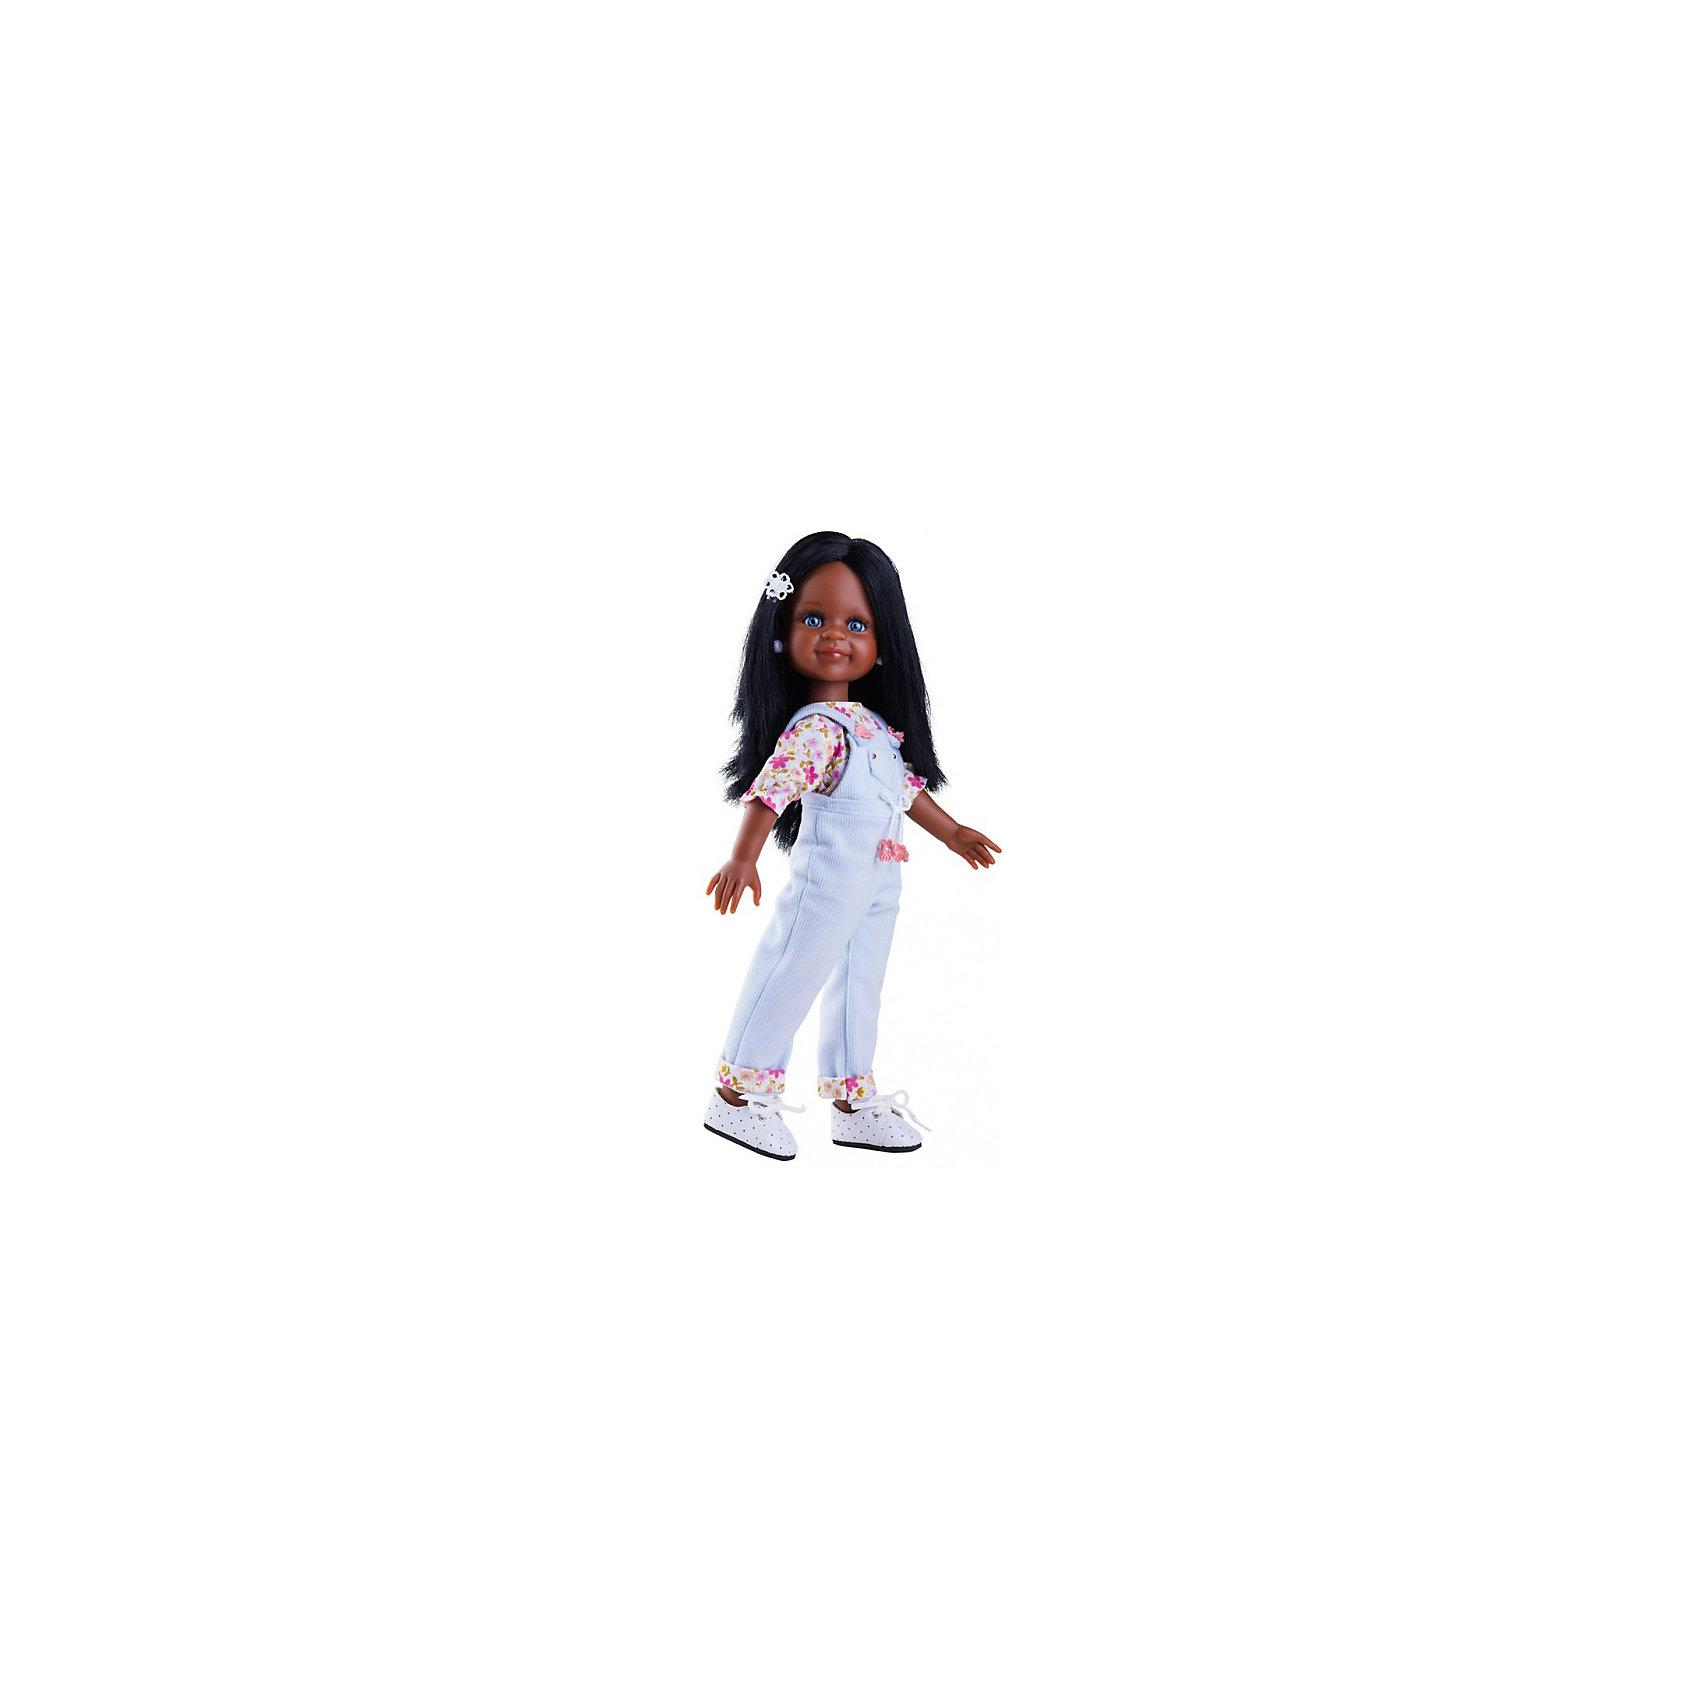 Кукла Paola Reina Нора Клеопатра, 32 смКлассические куклы<br><br><br>Ширина мм: 110<br>Глубина мм: 230<br>Высота мм: 410<br>Вес г: 667<br>Возраст от месяцев: 36<br>Возраст до месяцев: 144<br>Пол: Женский<br>Возраст: Детский<br>SKU: 7118824